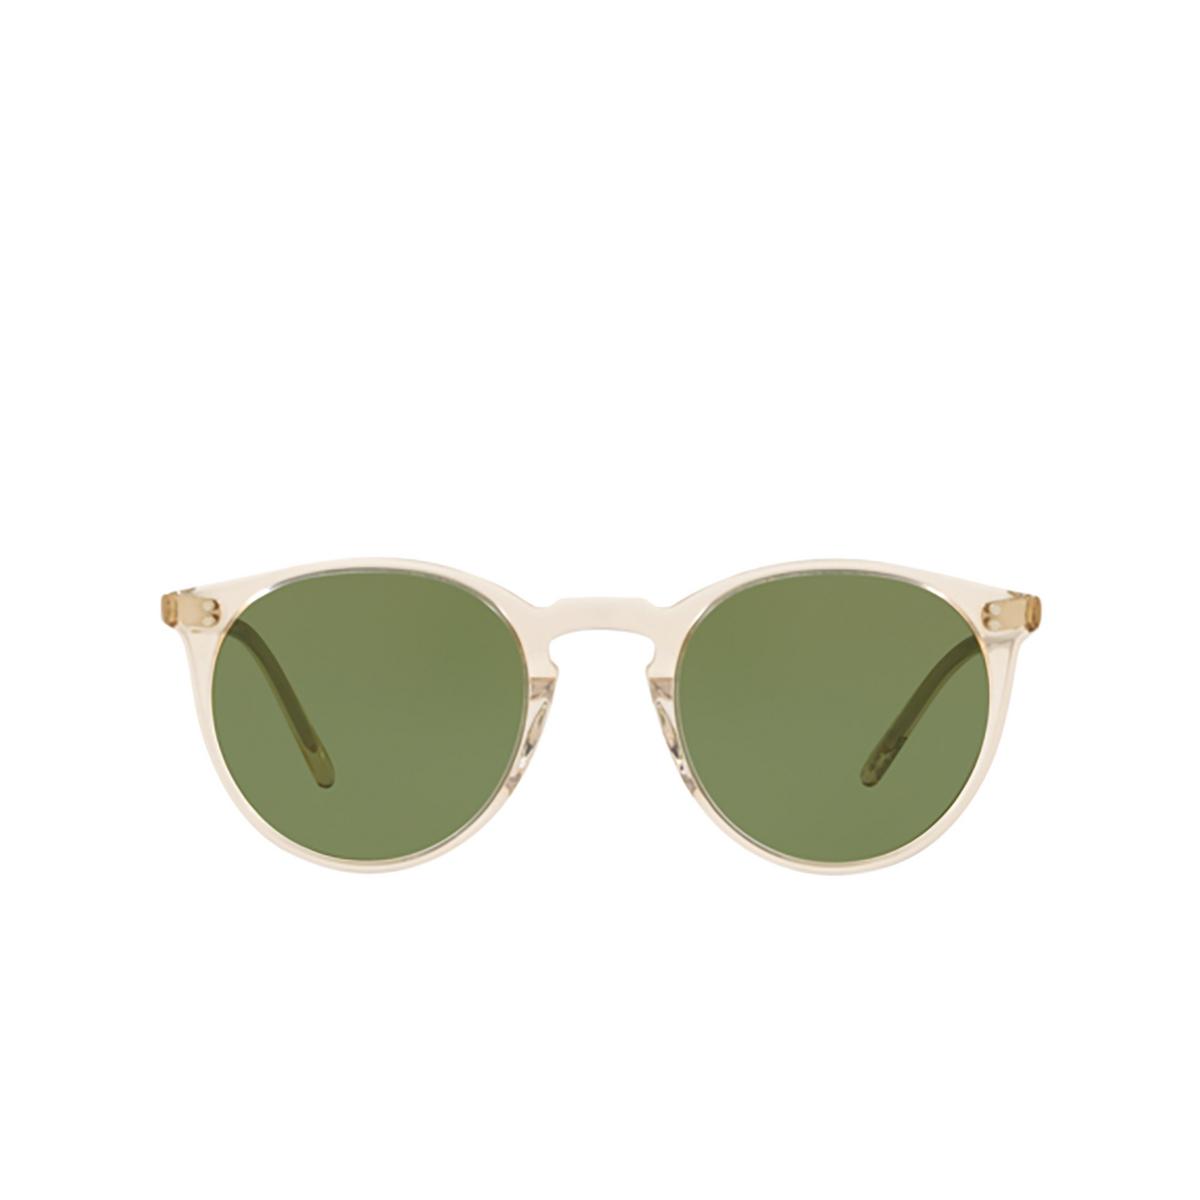 Oliver Peoples® Round Sunglasses: O'malley Sun OV5183S color Buff 109452.